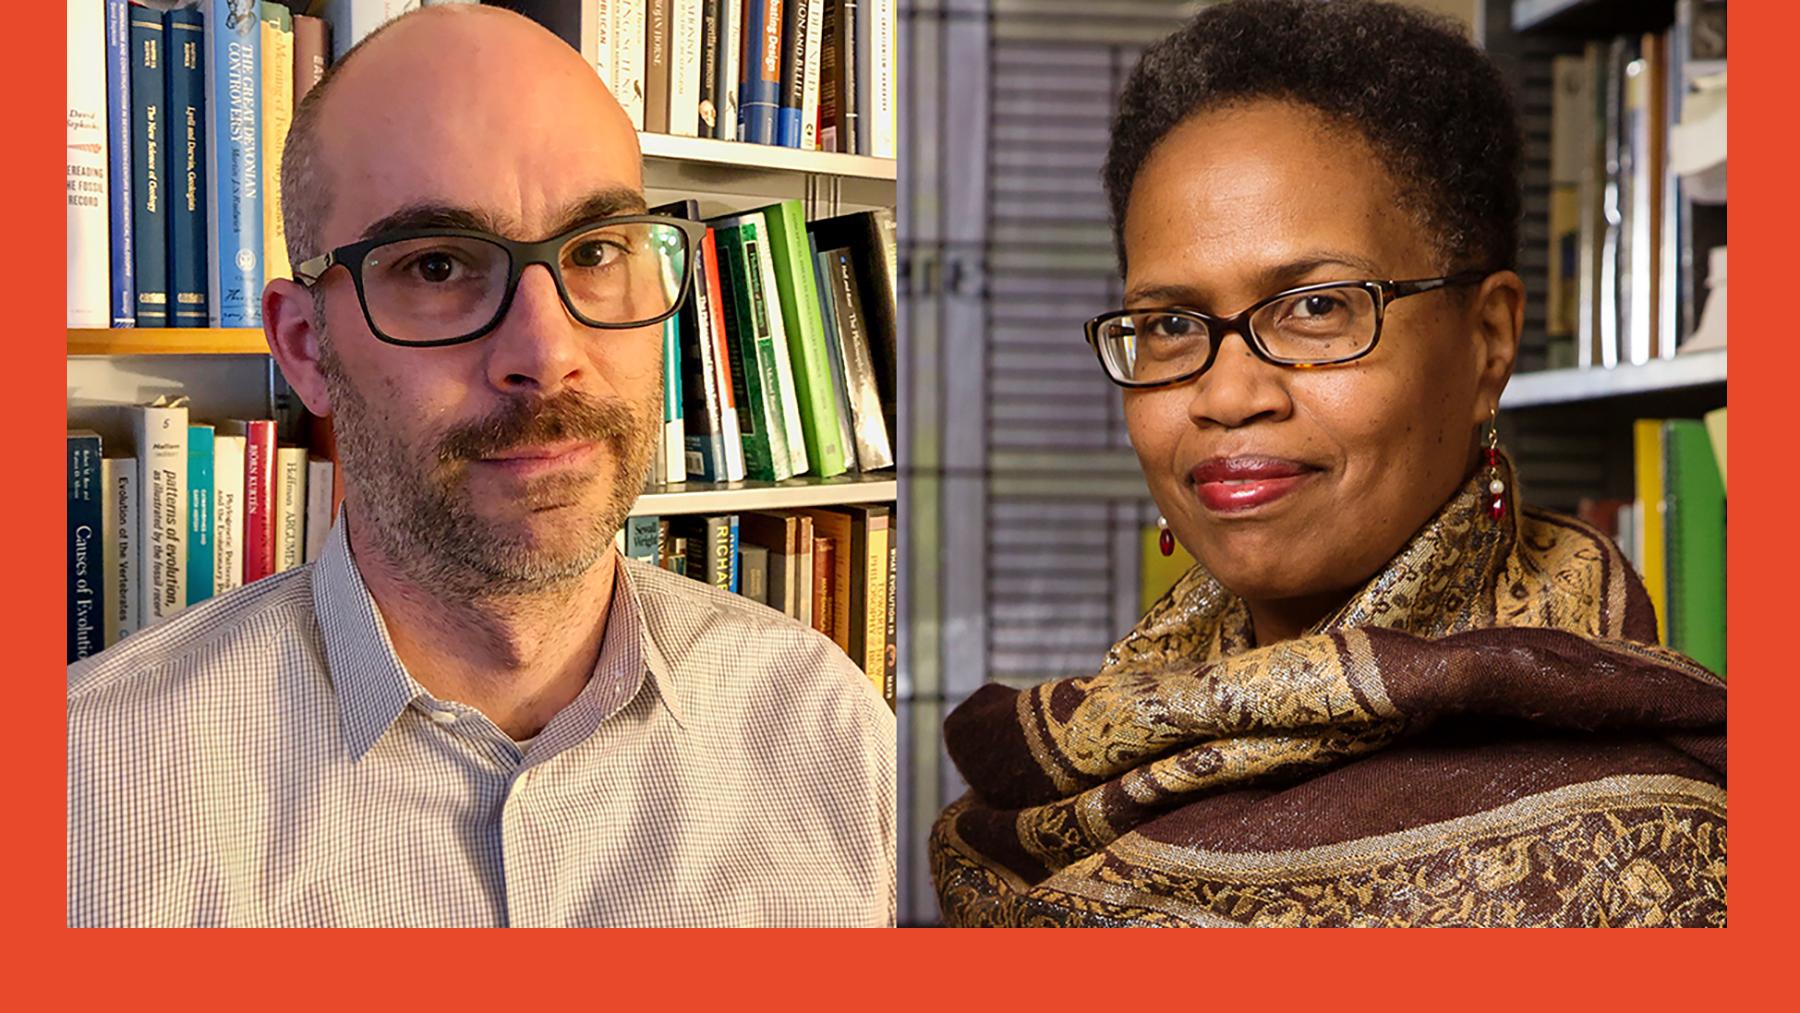 2020 Guggenheim Fellows David Sepkoski and Janice N. Harrington. (Sepkoski photo by Teri Chettiar, Harrington photo by L. B. Stauffer)